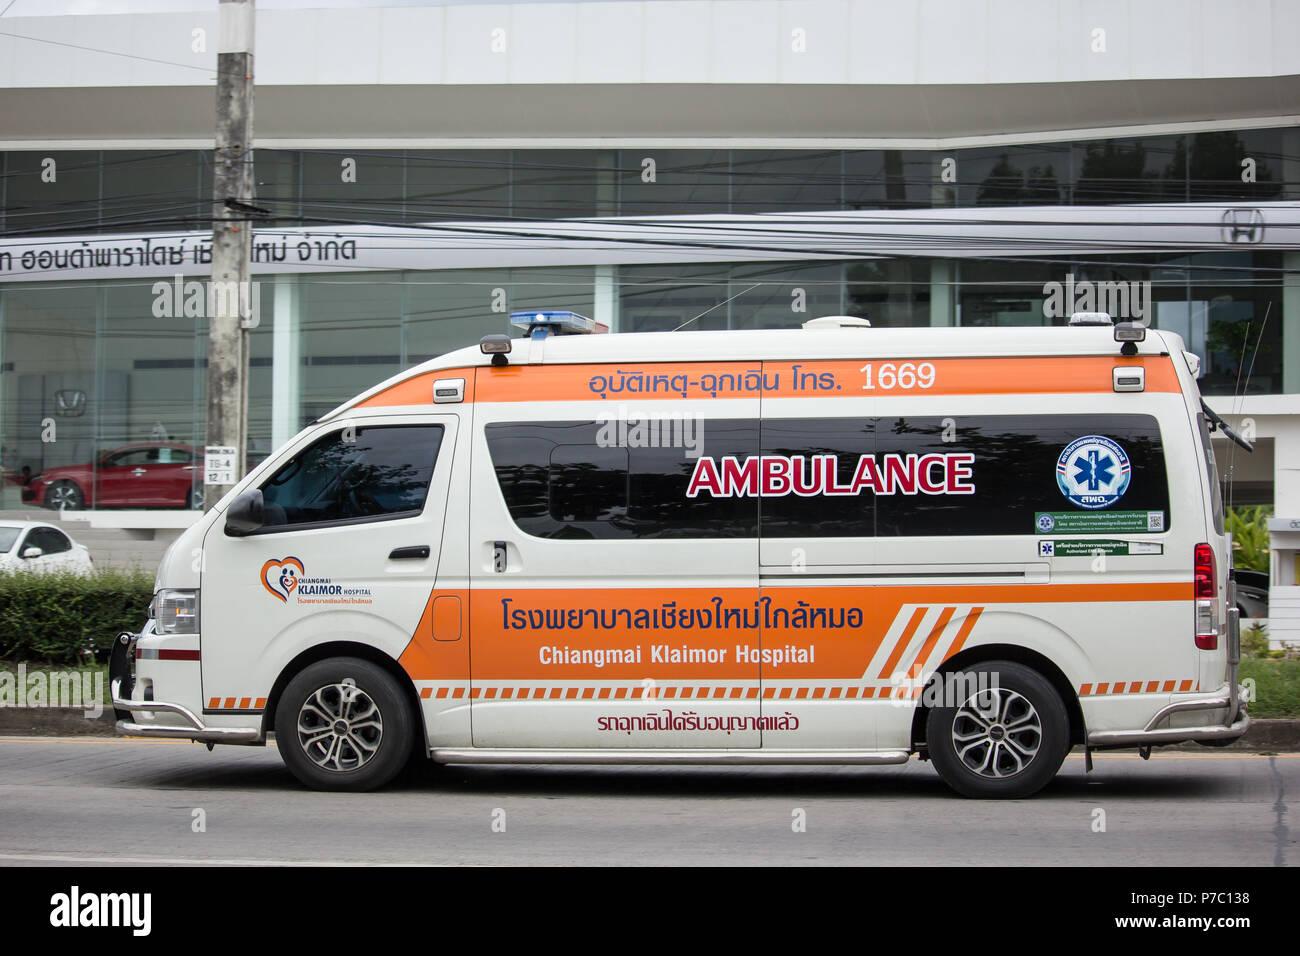 Chiangmai, Thailand - June 21 2018: Ambulance Van of